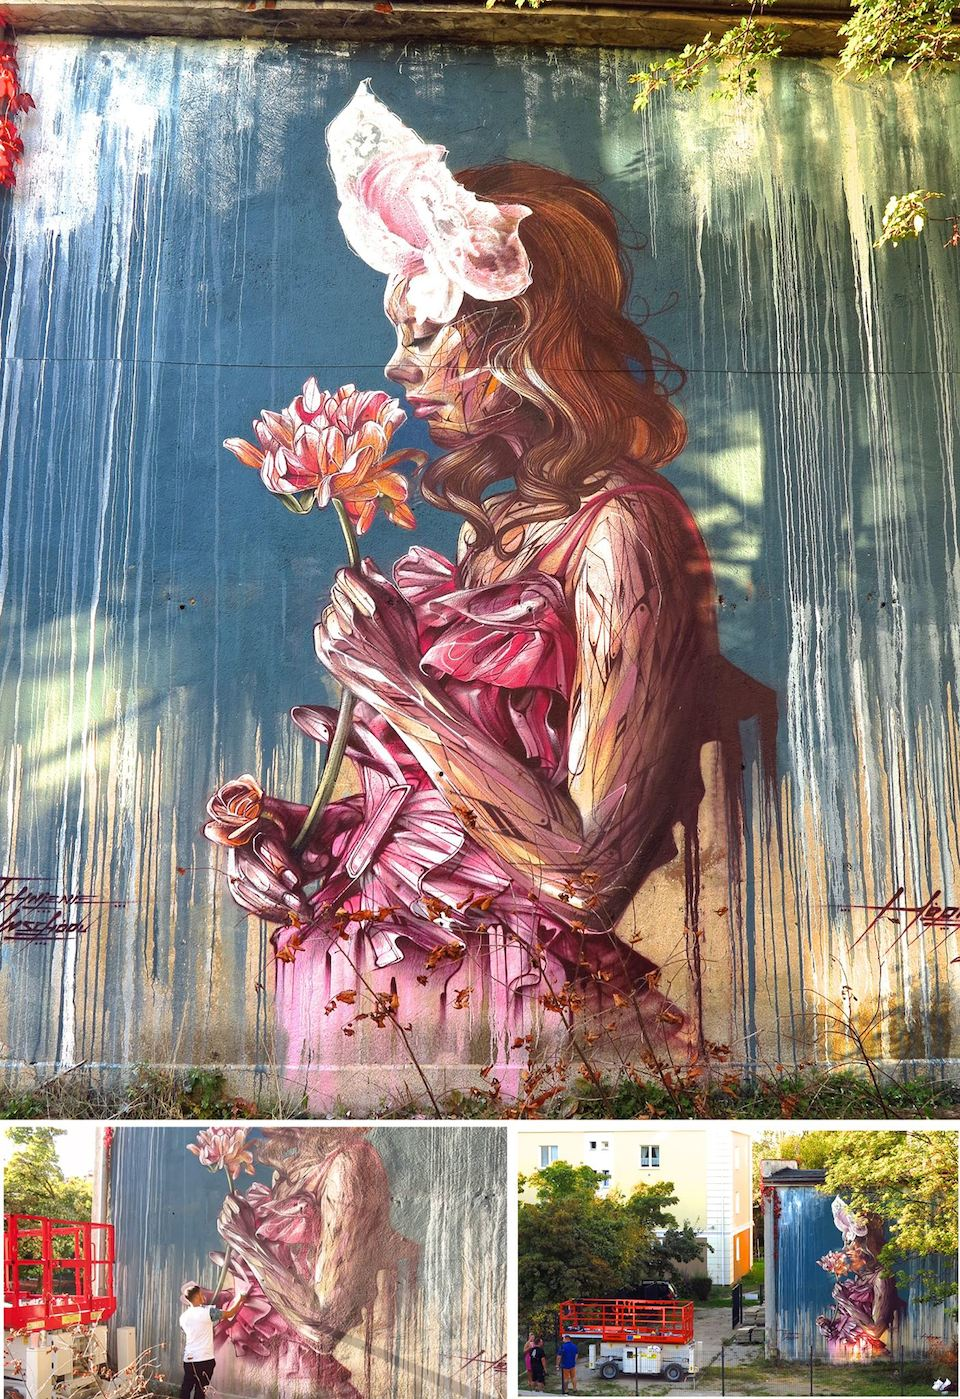 Street Art by Hopare in  Gdynia, Poland 306985